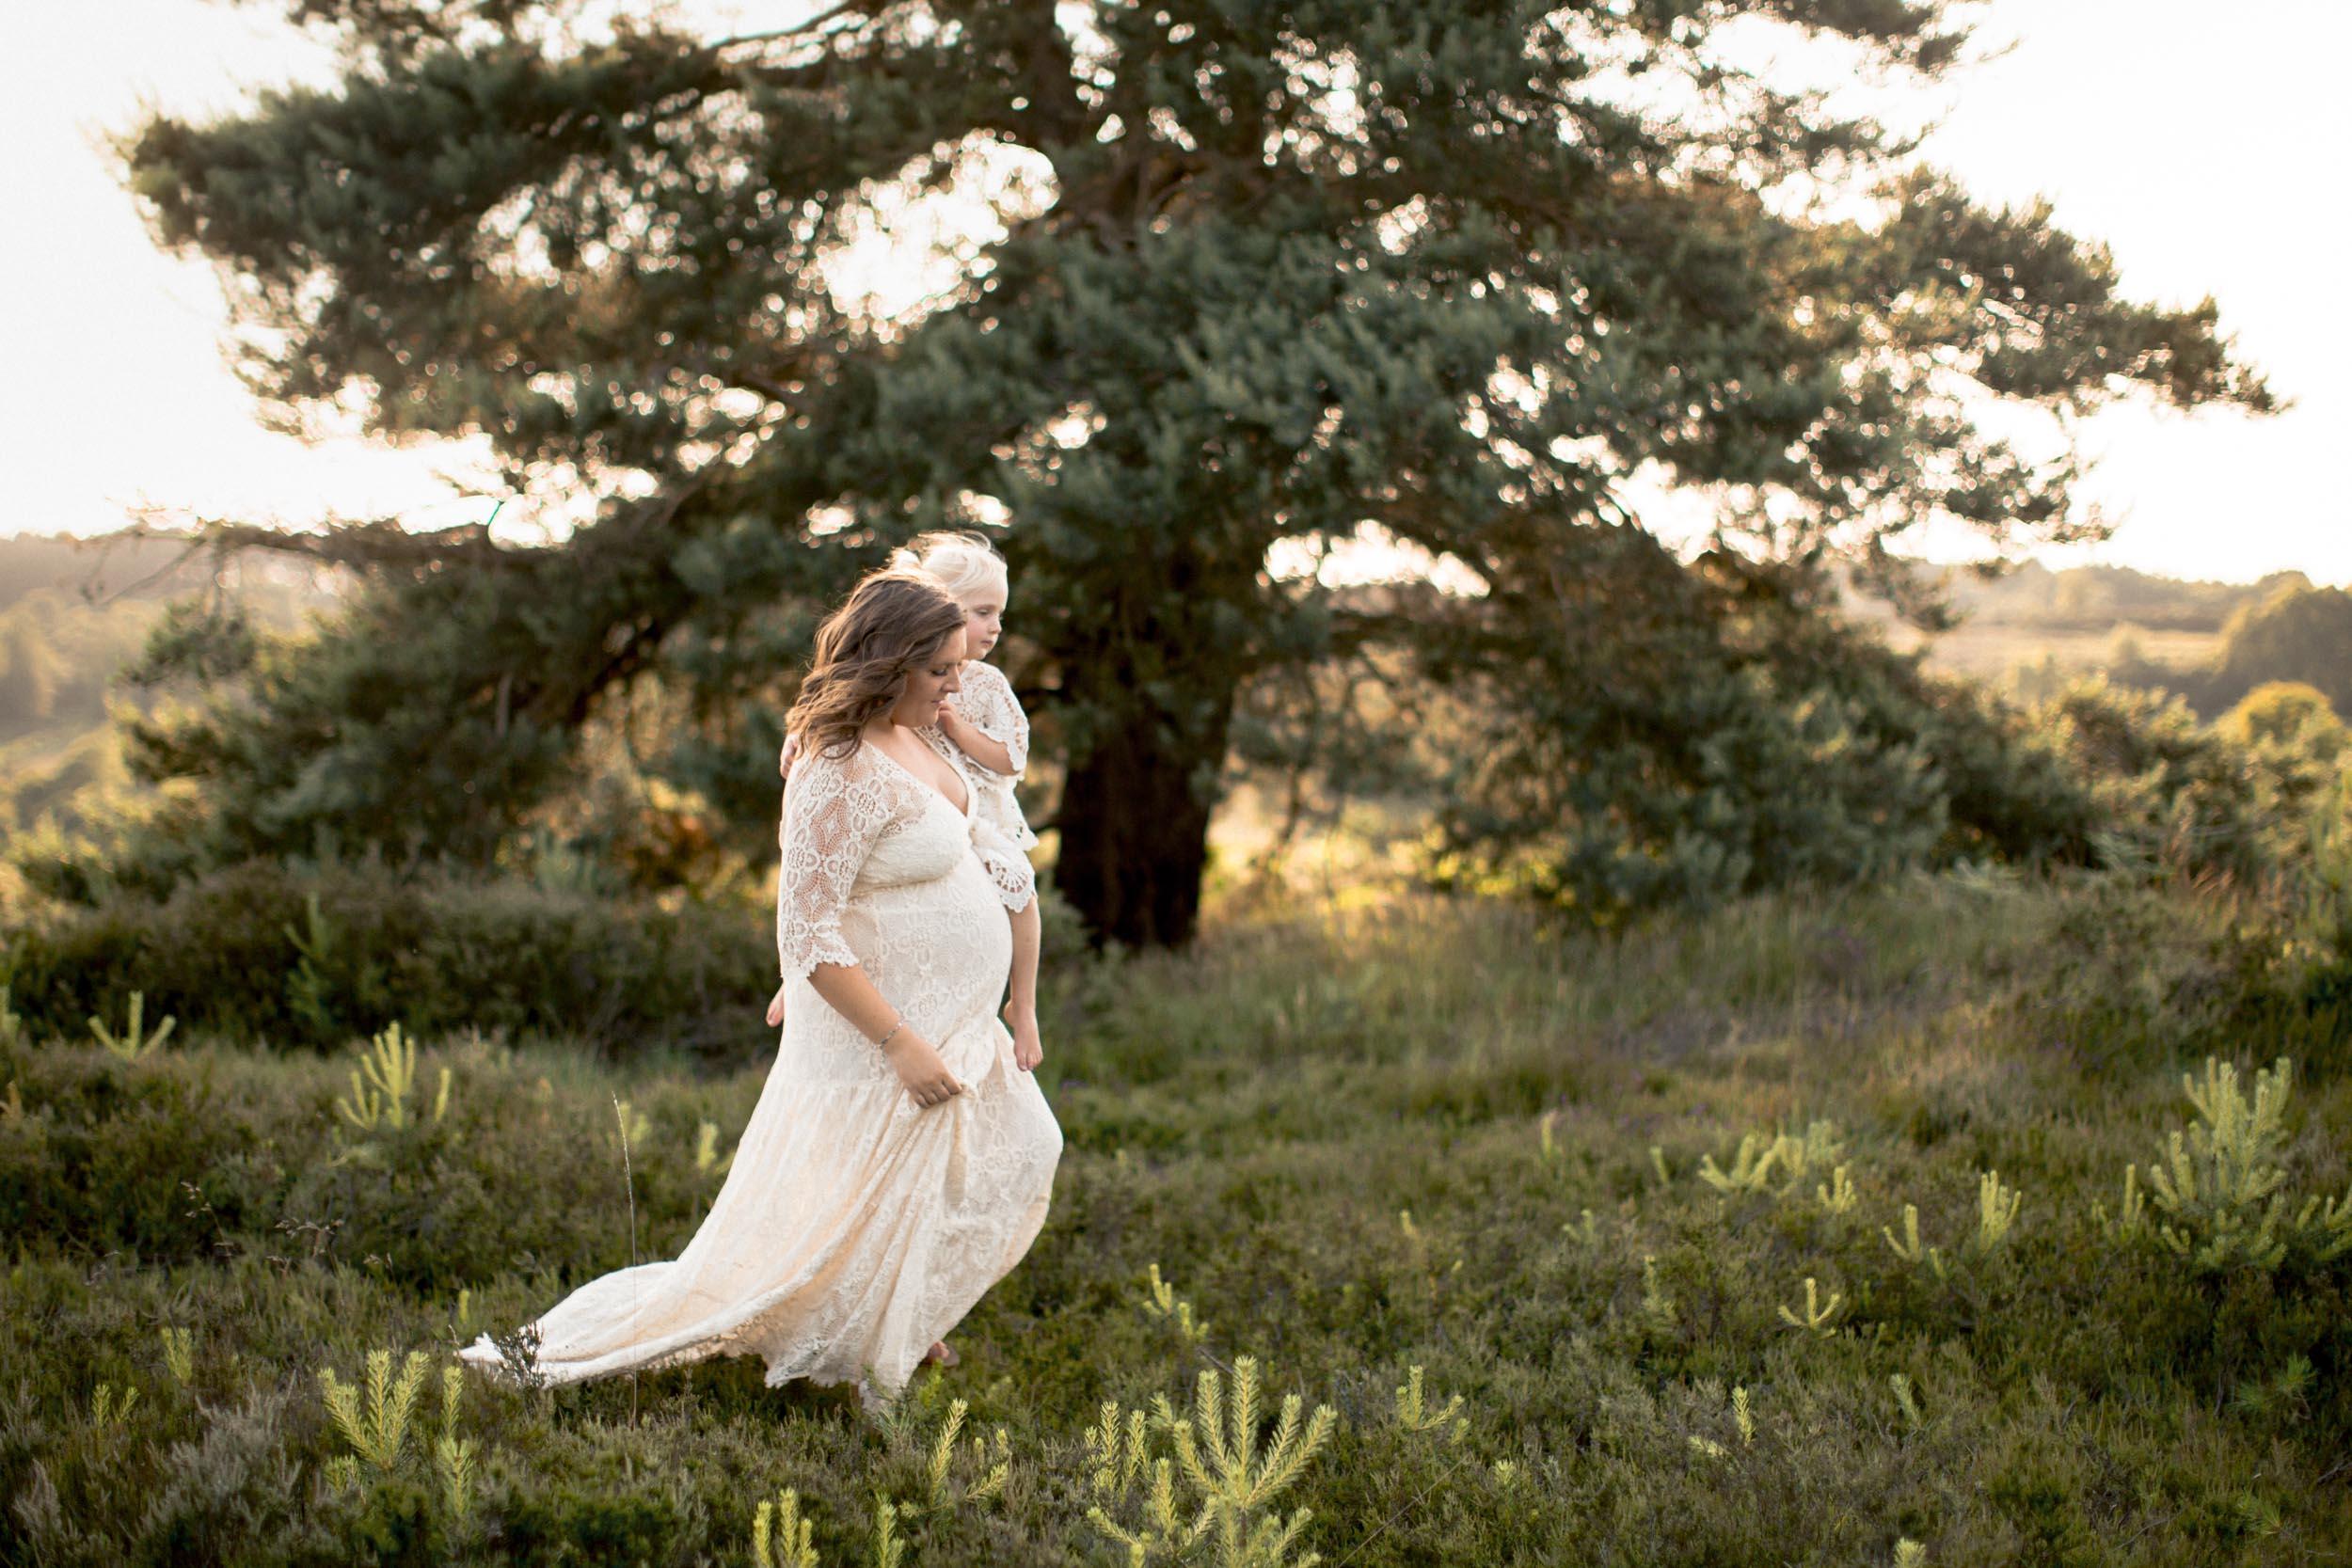 Rebecca Searle Photography Maternity Photography 6.jpg